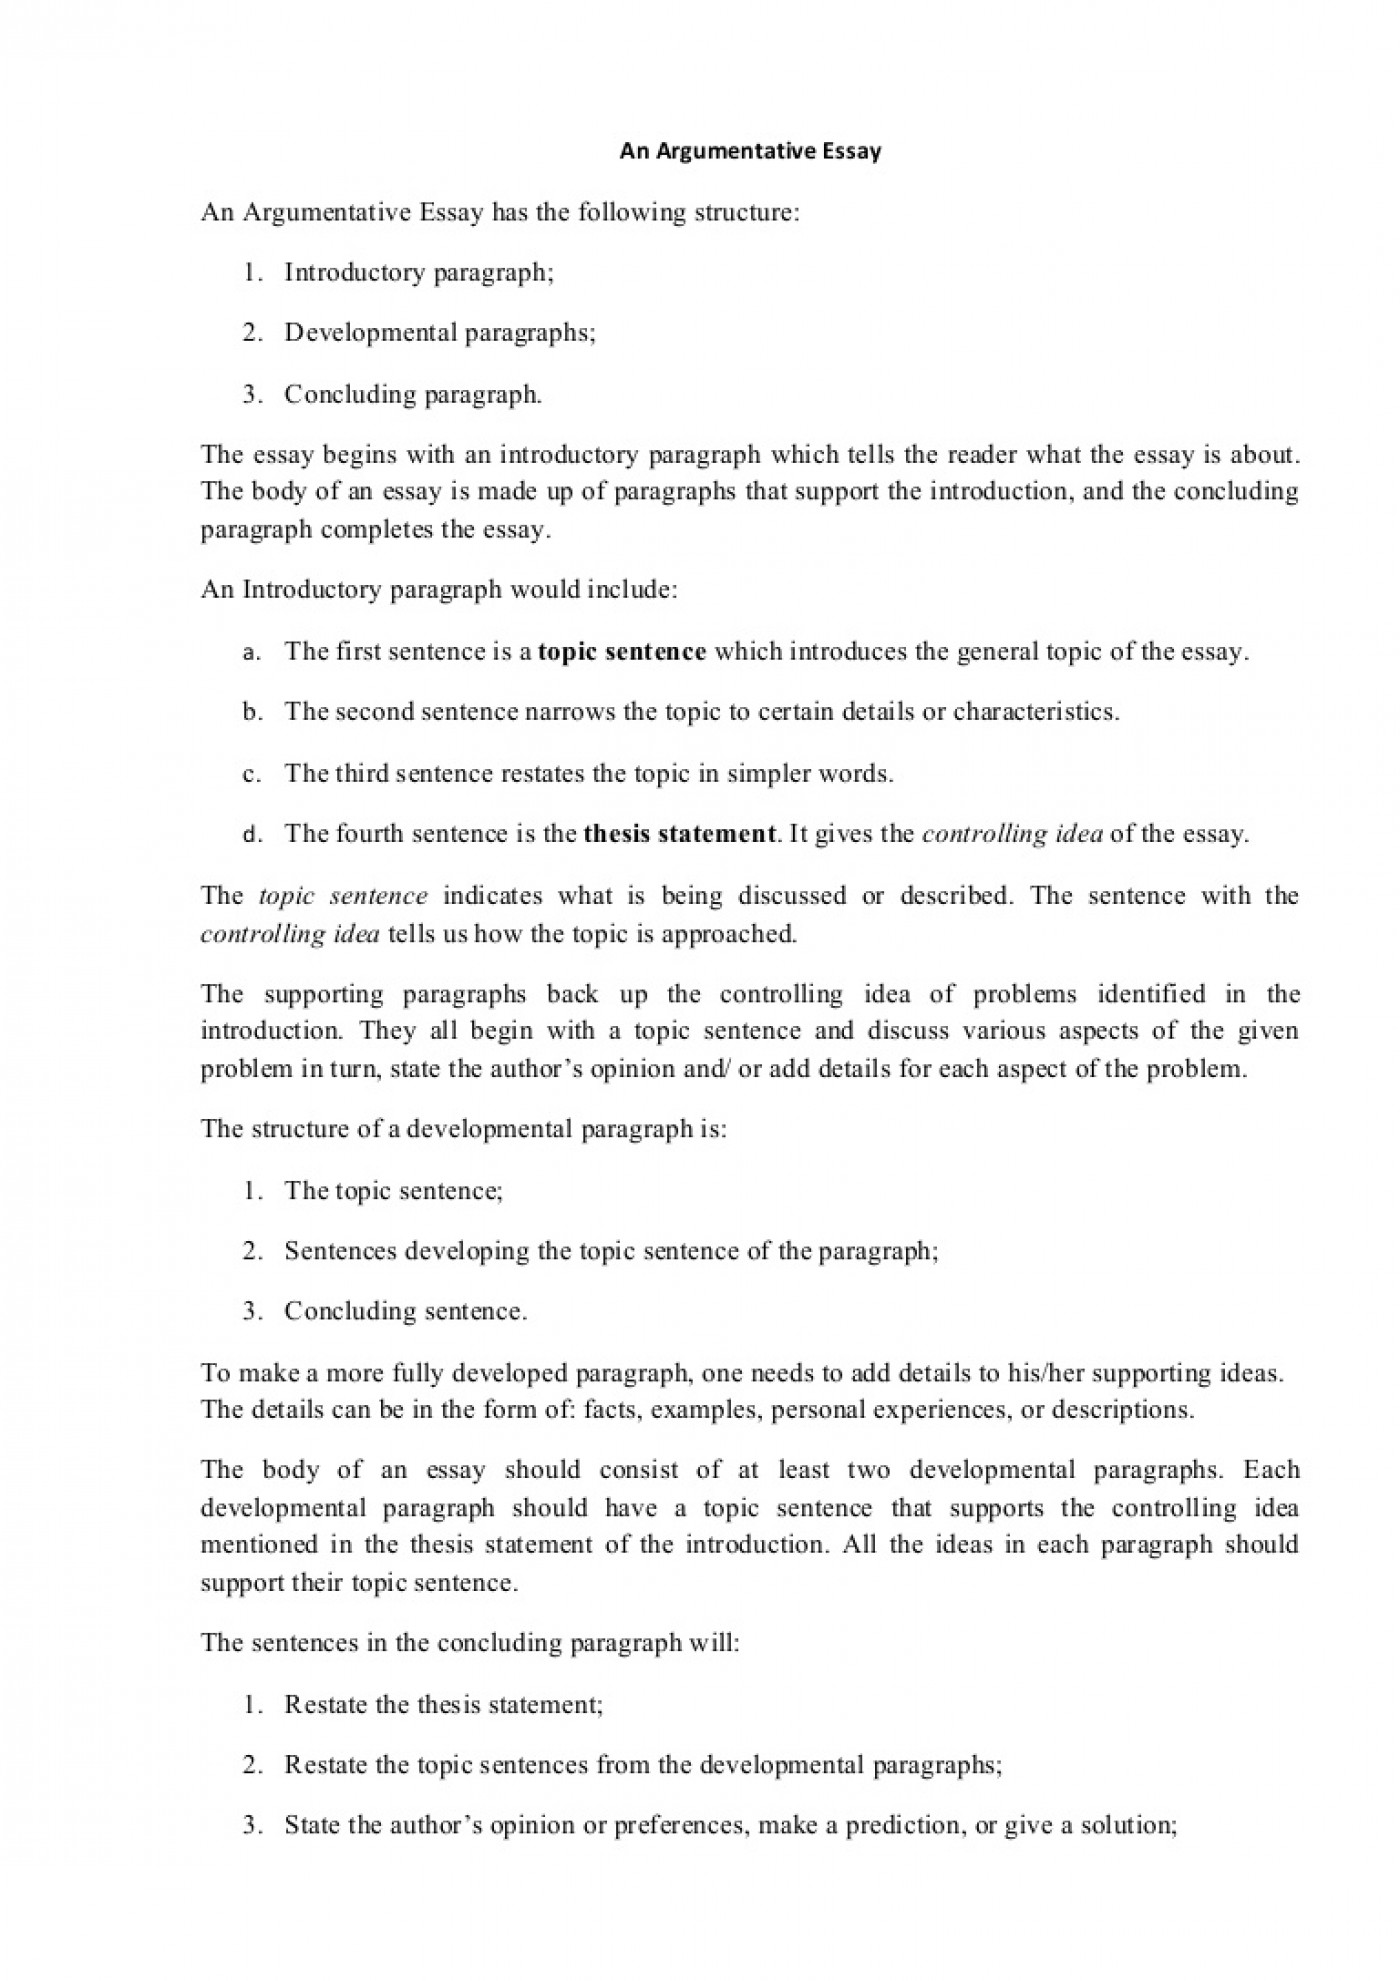 005 Argumentativeessaystructure Phpapp01 Thumbnail Essay Example Persuasive Outstanding Structure Pdf Prezi Nat 5 1400